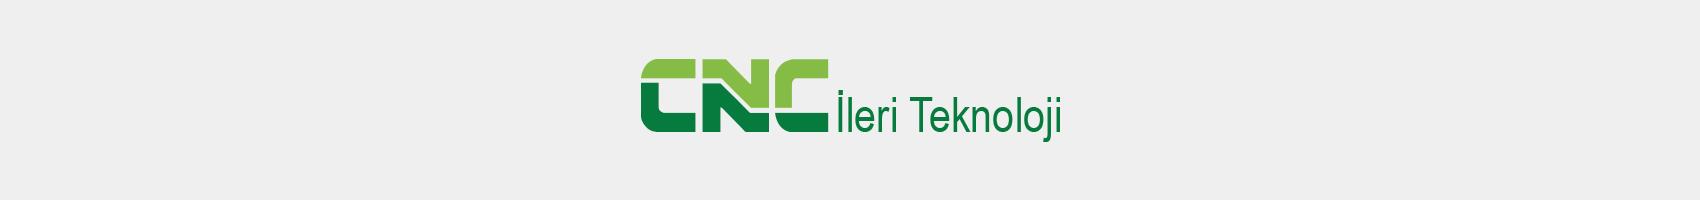 cnc-yer-tutucu-logo-1700x200